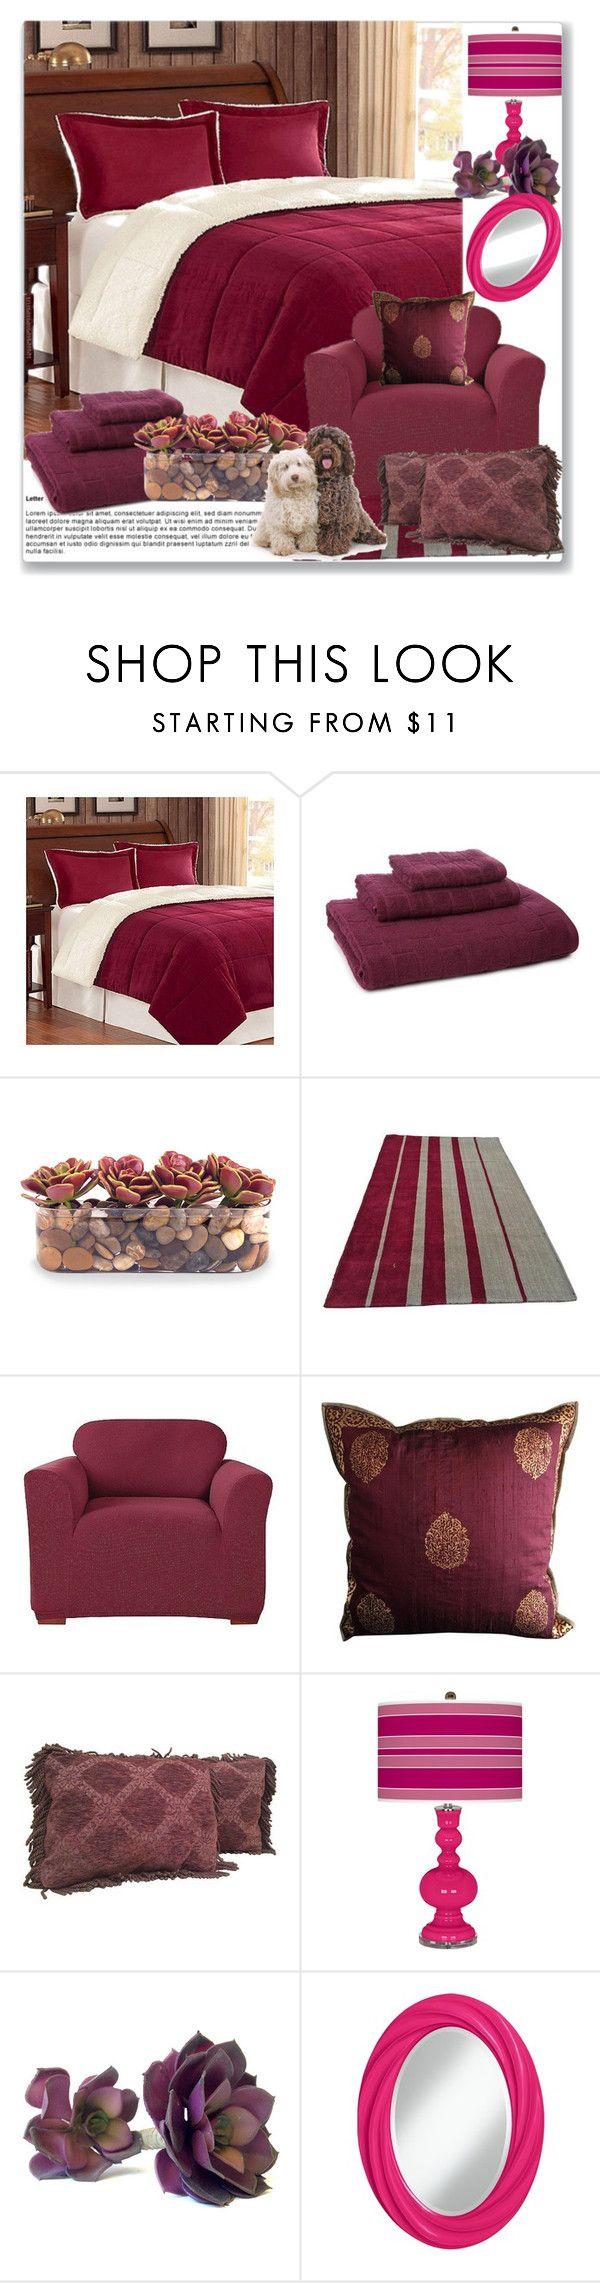 25 best ideas about skull carpet on pinterest purple sofa purple - 25 Best Burgundy Room Ideas On Pinterest Burgundy Bedroom